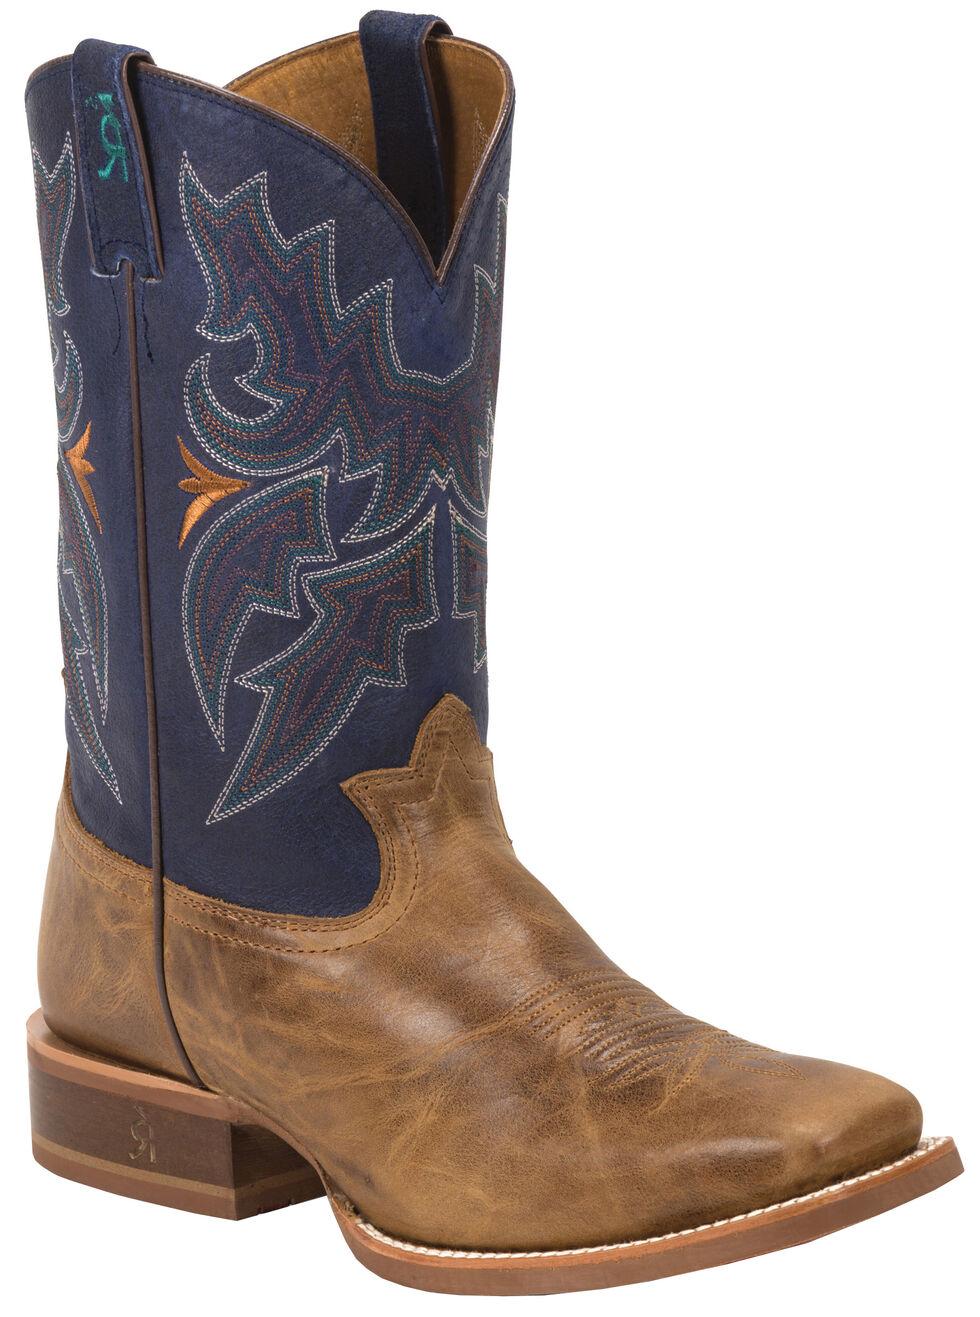 Tony Lama Honey Sierra 3R Stockman Cowboy Boots - Square Toe , Honey, hi-res